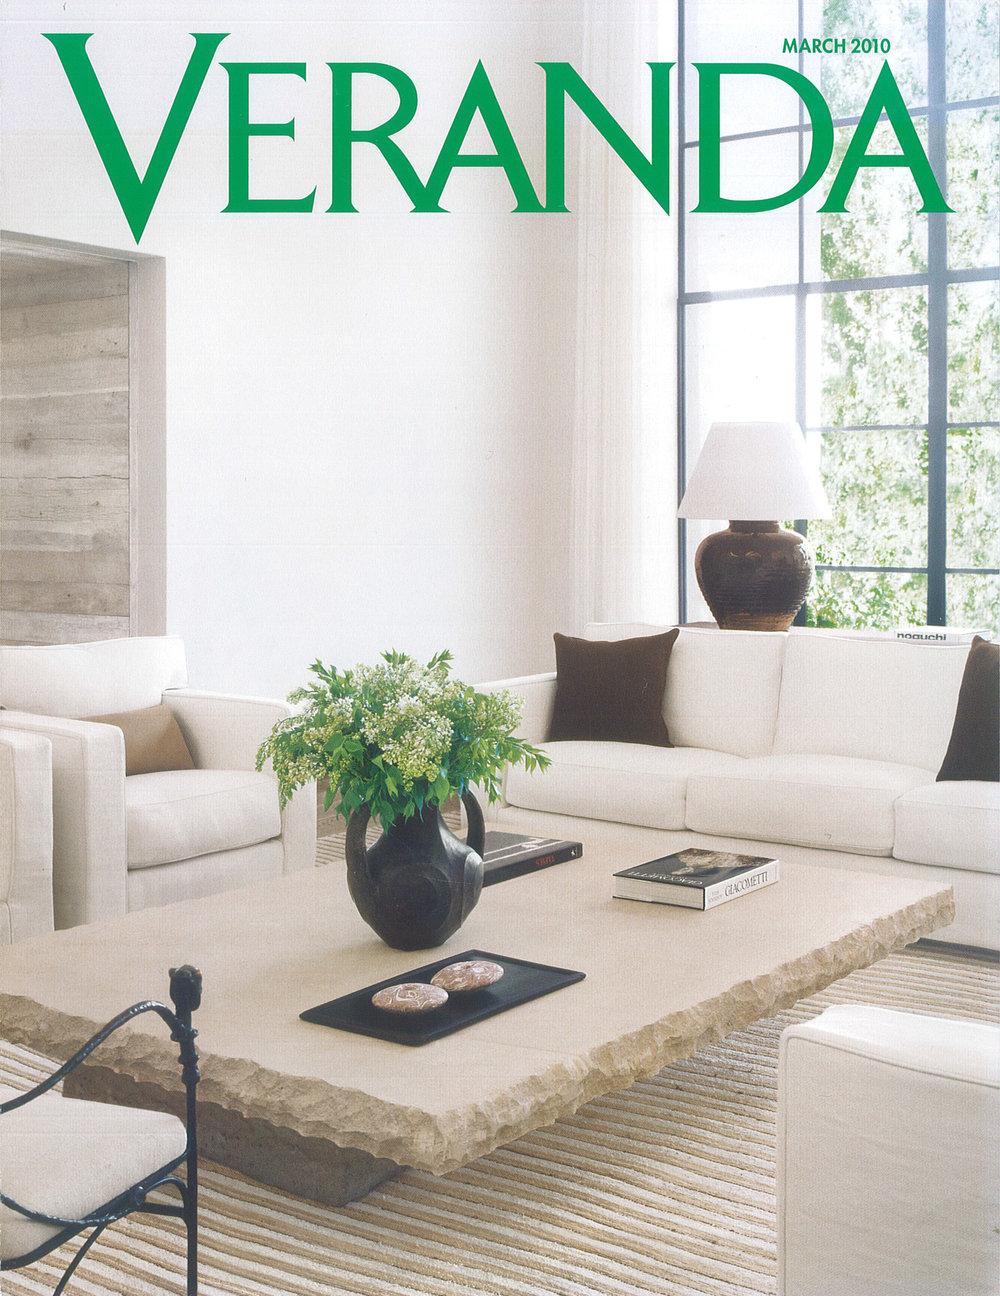 VERANDA - RANCHO SANTA FE